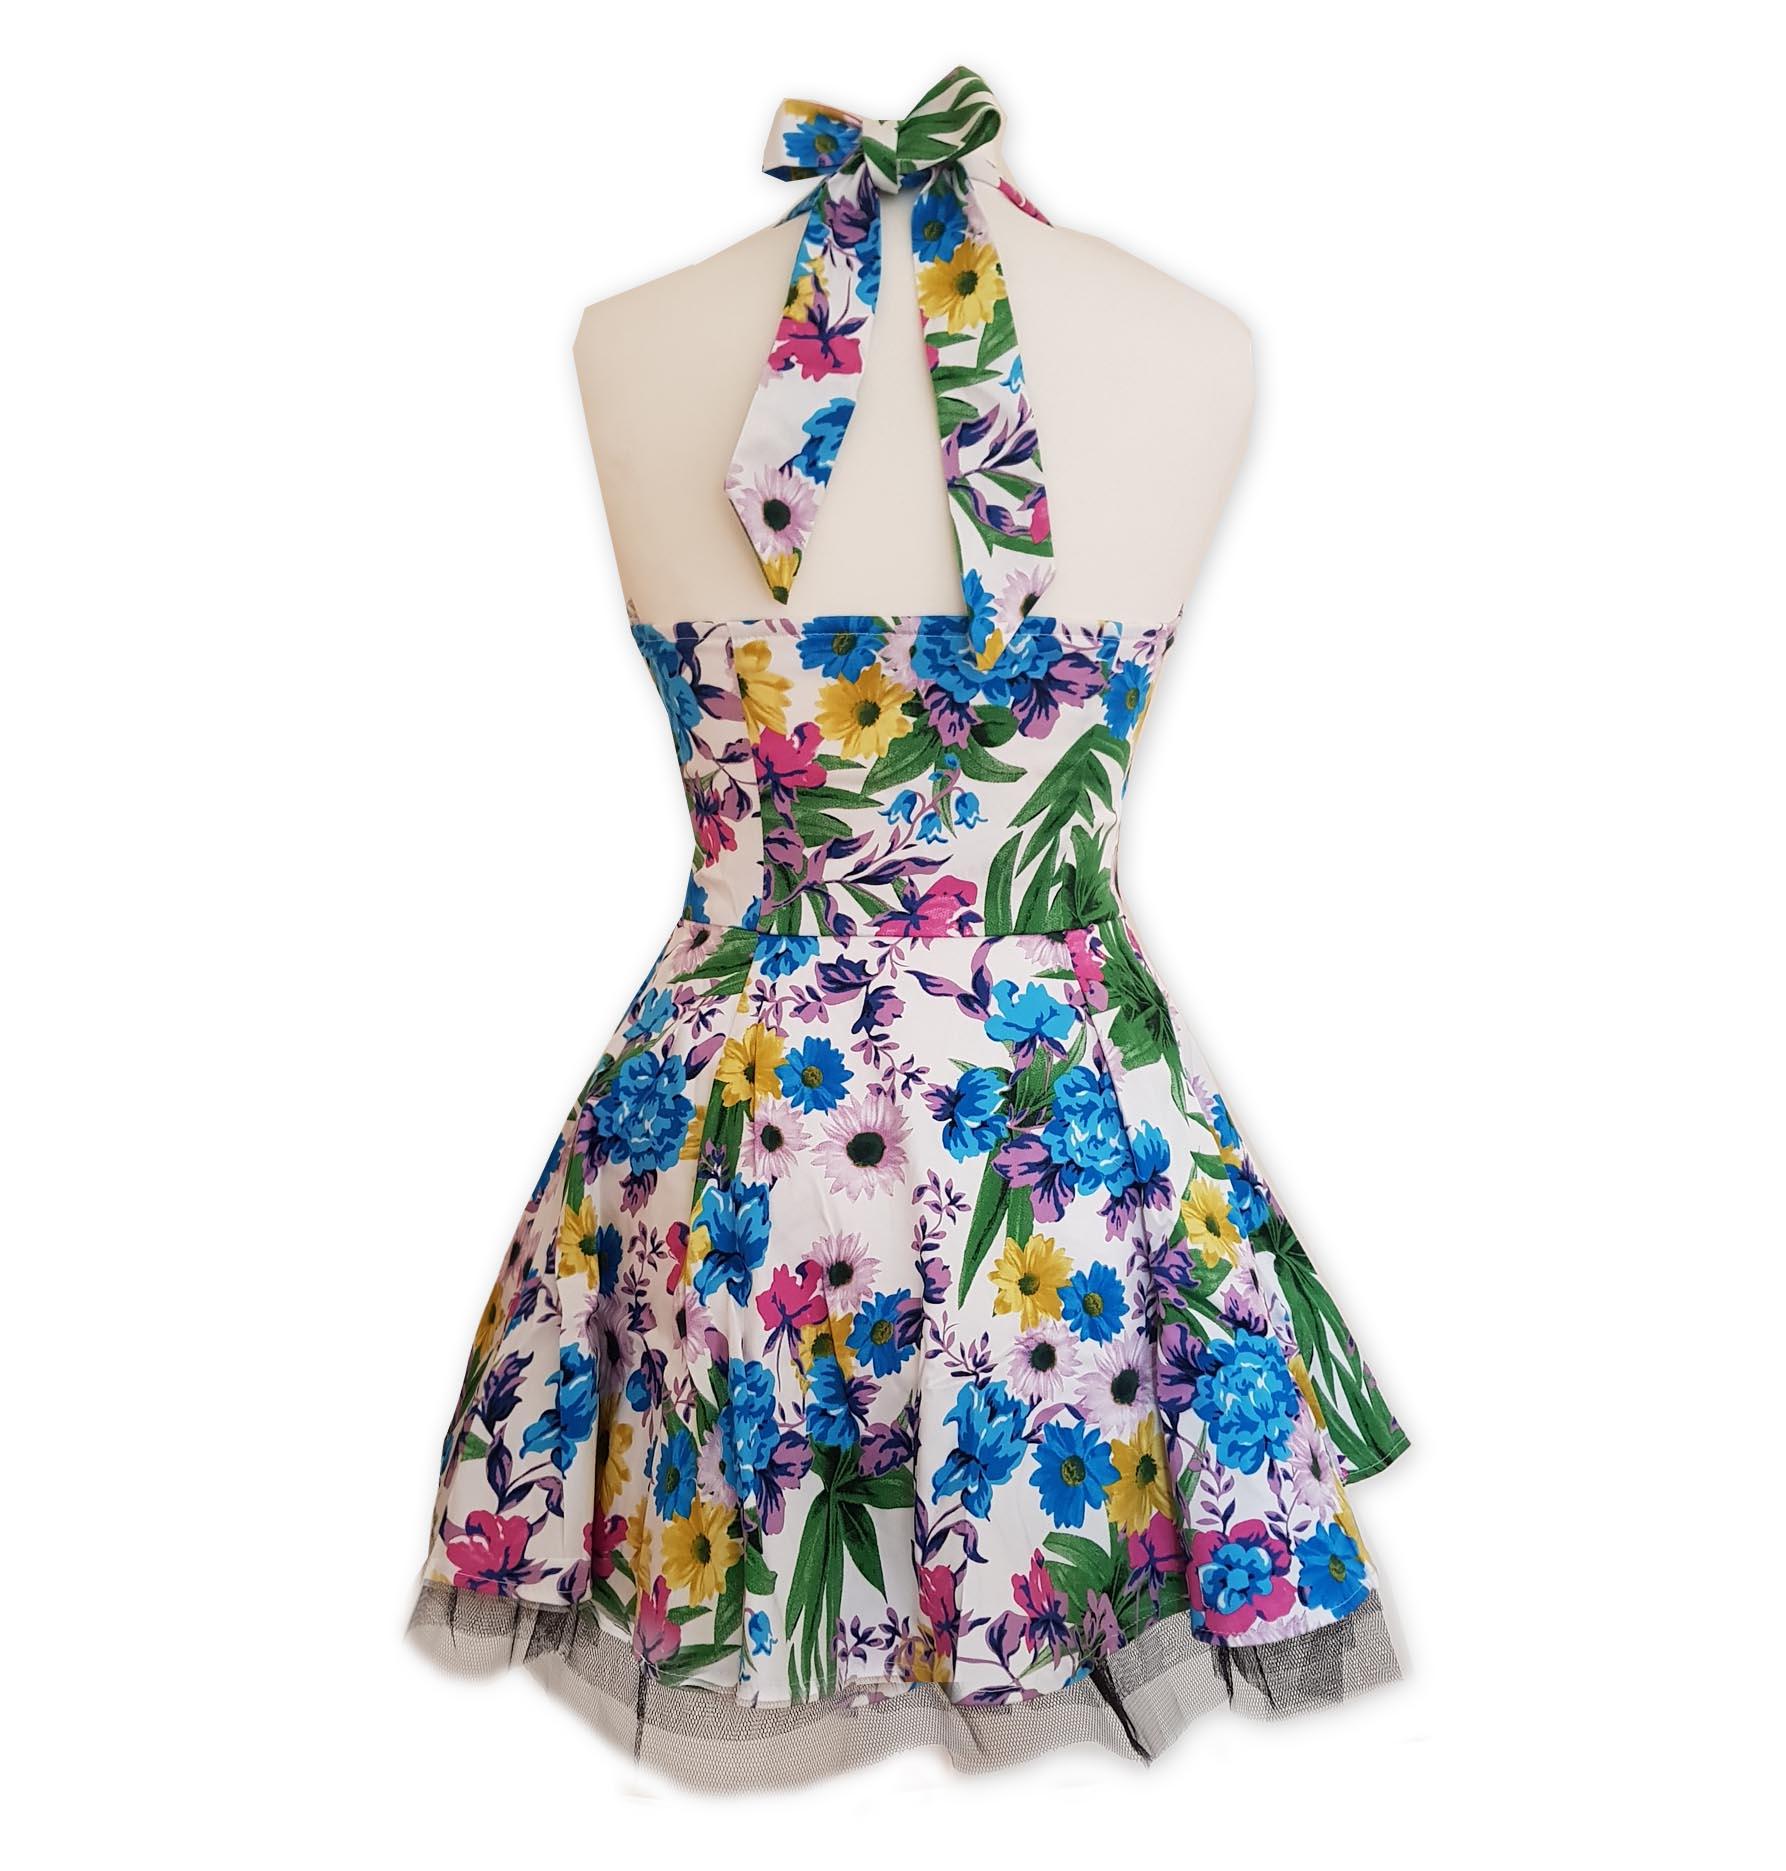 H-amp-R-Hearts-amp-Roses-London-White-Mini-Dress-039-Summer-Day-039-Flowers-All-Sizes thumbnail 5